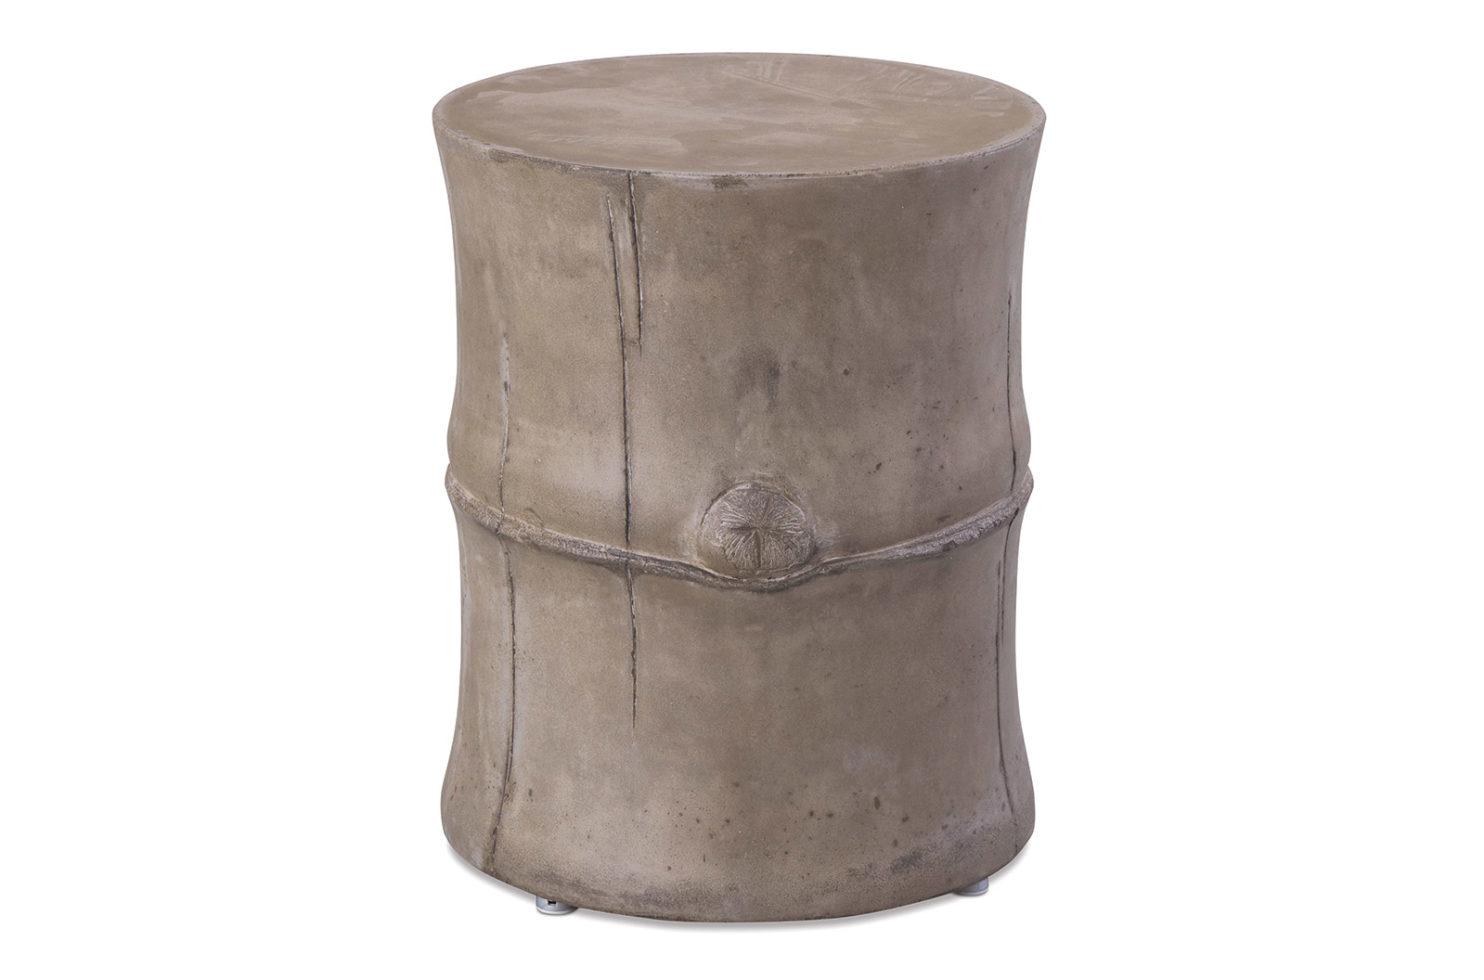 Perpetual Bamboo Stool 501FT045P2G, Gray